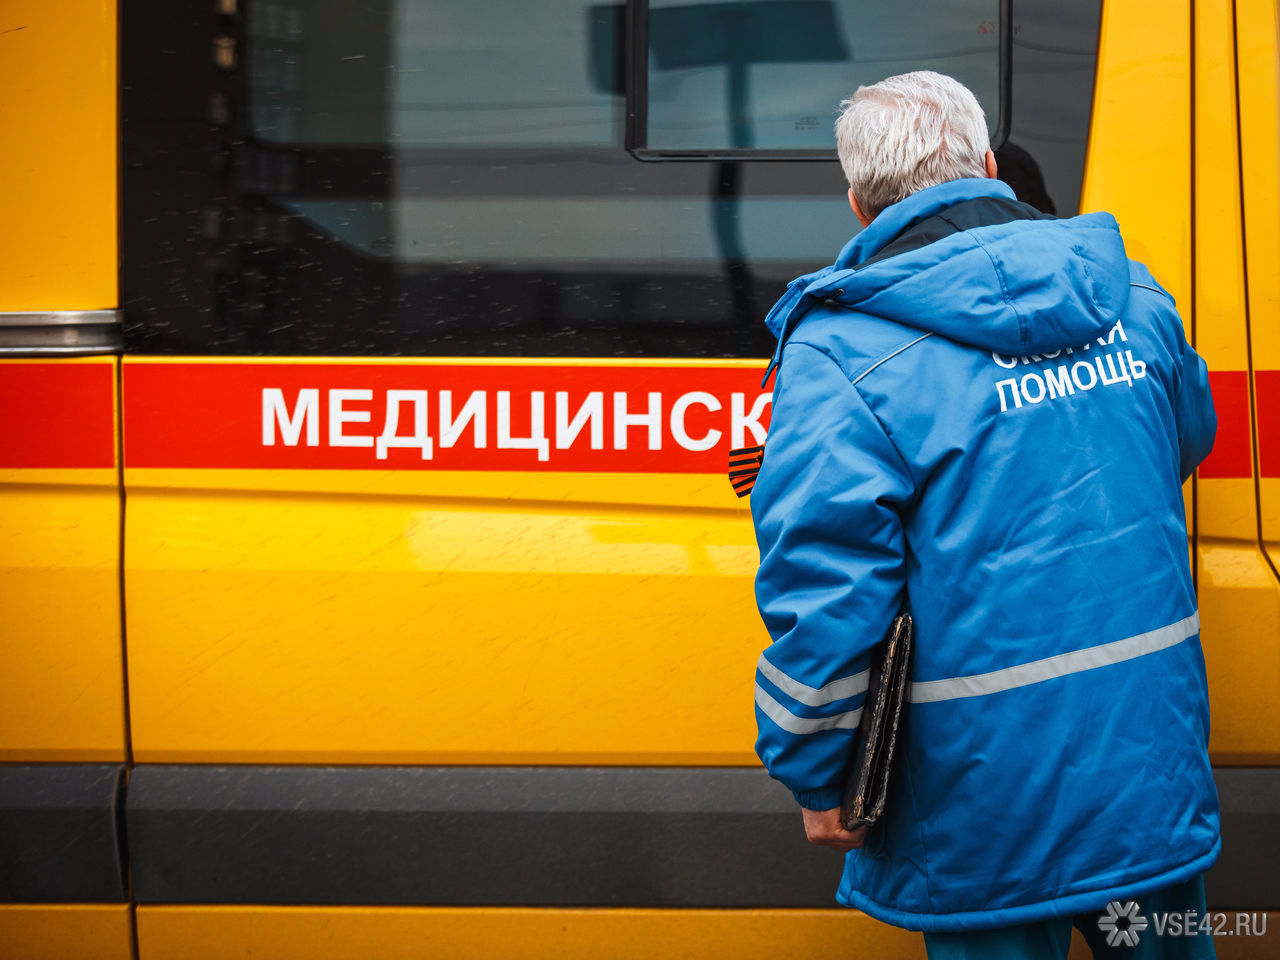 ВКузбассе натрассе фургон «МАЗ» насмерть задавил мужчину